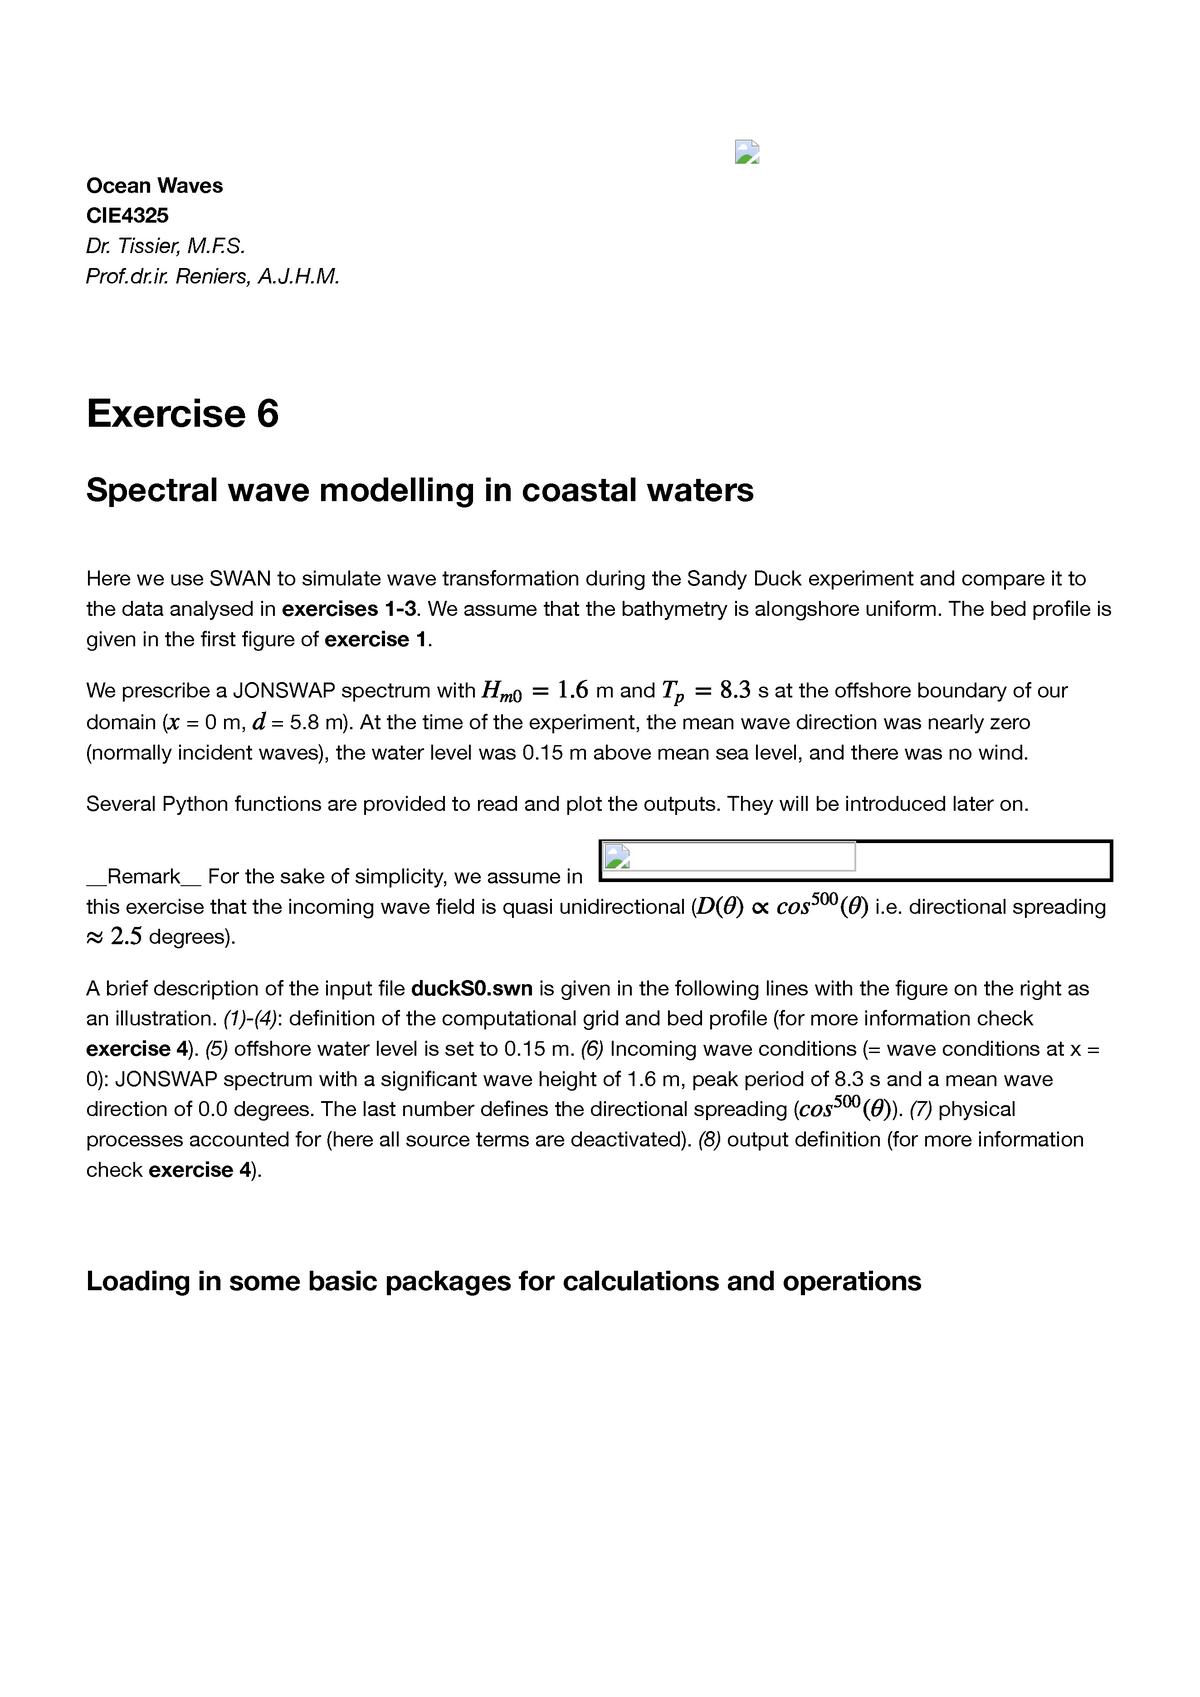 Exercise 6 - Answers to Ex 6 python mac - CIE4325: Ocean Waves - StuDocu